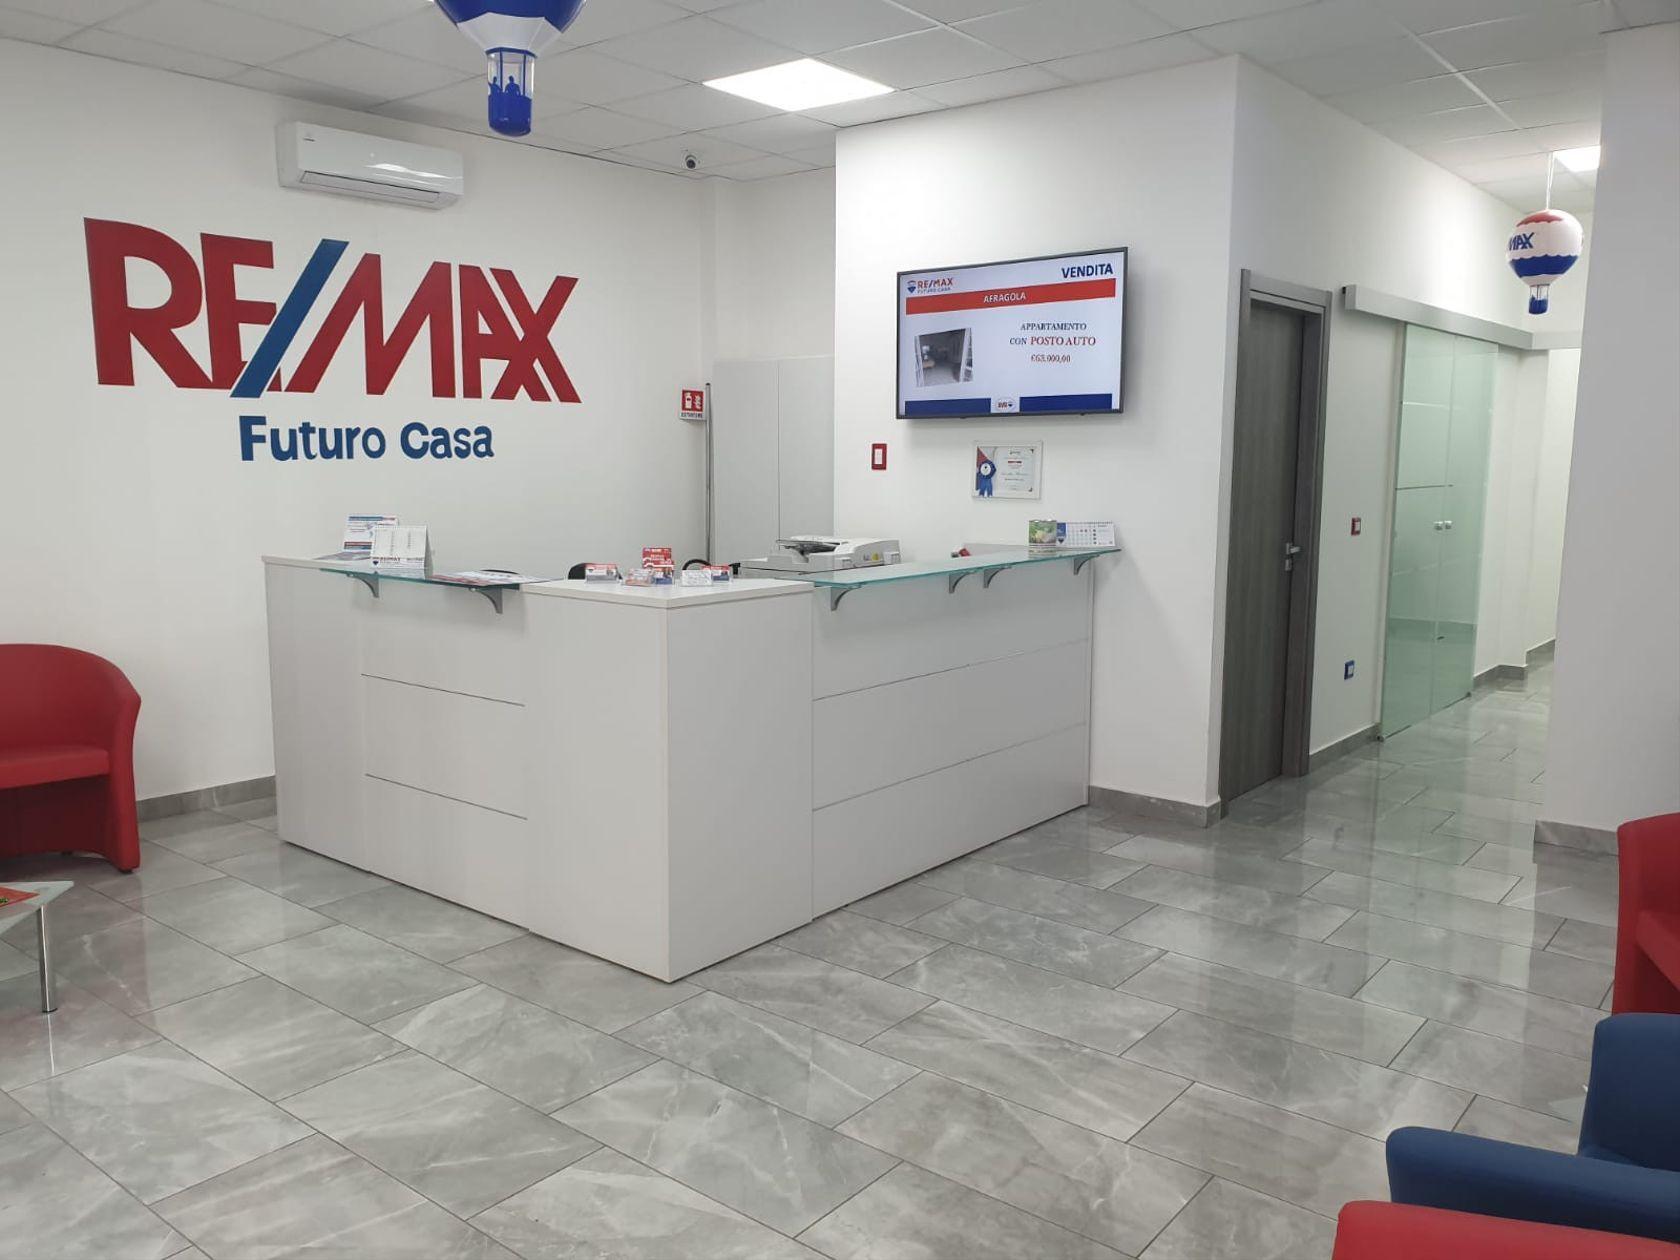 RE/MAX Futuro Casa Afragola - Foto 3